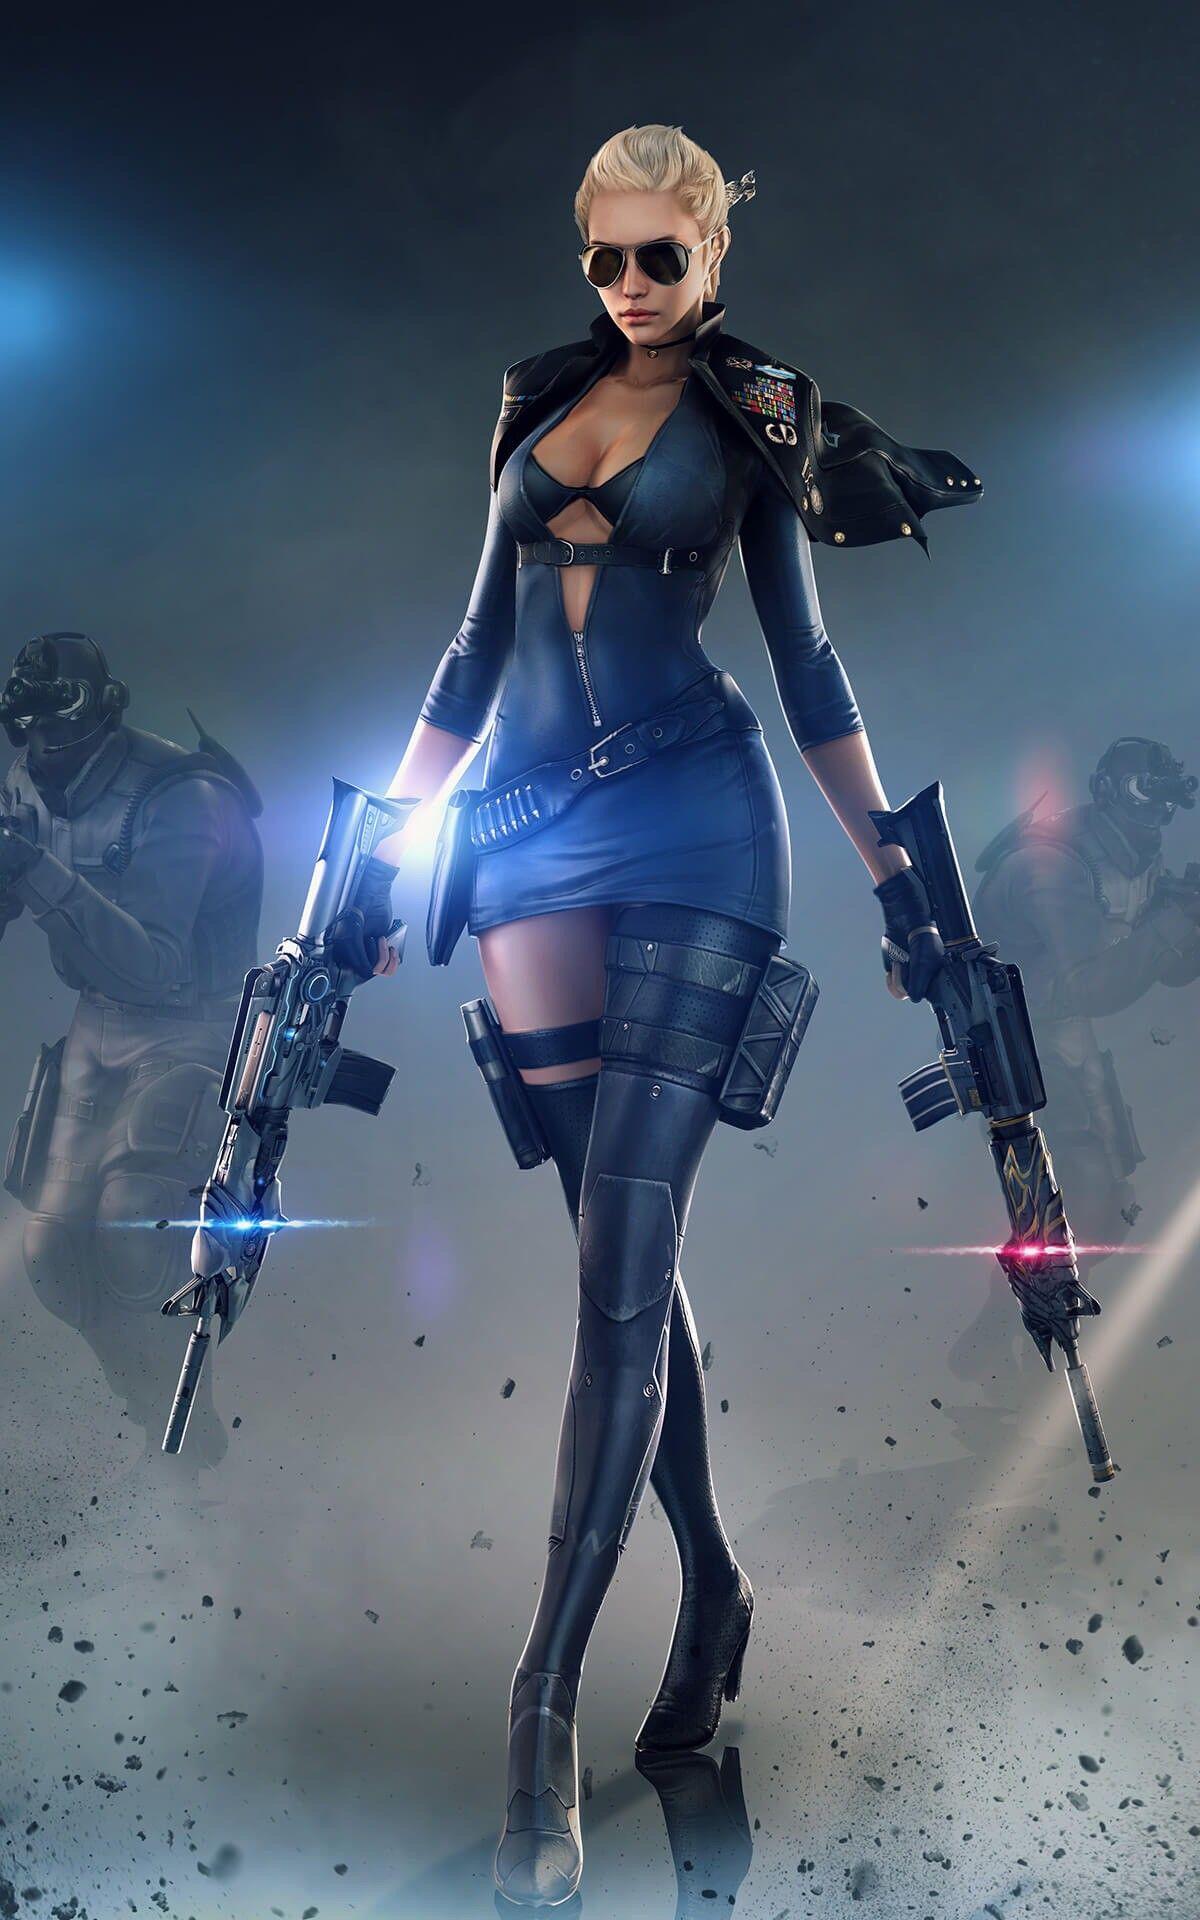 pc gaming crossfire wallpaper in 2020 | Fantasy female ...  Final Fantasy Female Characters Wallpaper